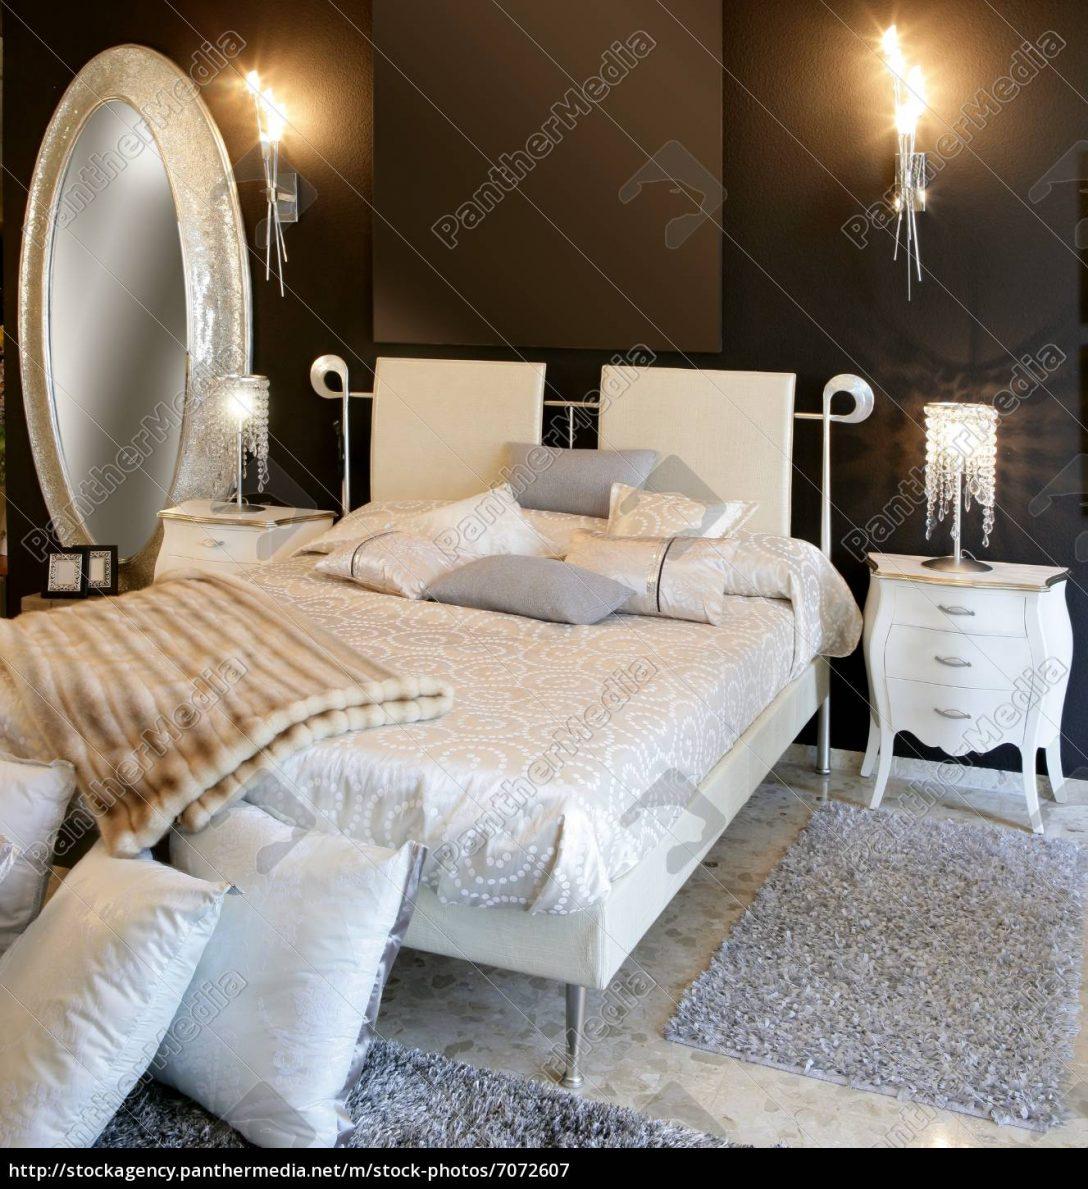 Large Size of Schlafzimmer Moderne Silber Ovale Spiegel Weies Bett Trends Betten Lattenrost Baza Bei Ikea 100x200 Buche Xxl 180x200 Jabo Mit Stauraum 140x200 Skandinavisch Bett Weißes Bett